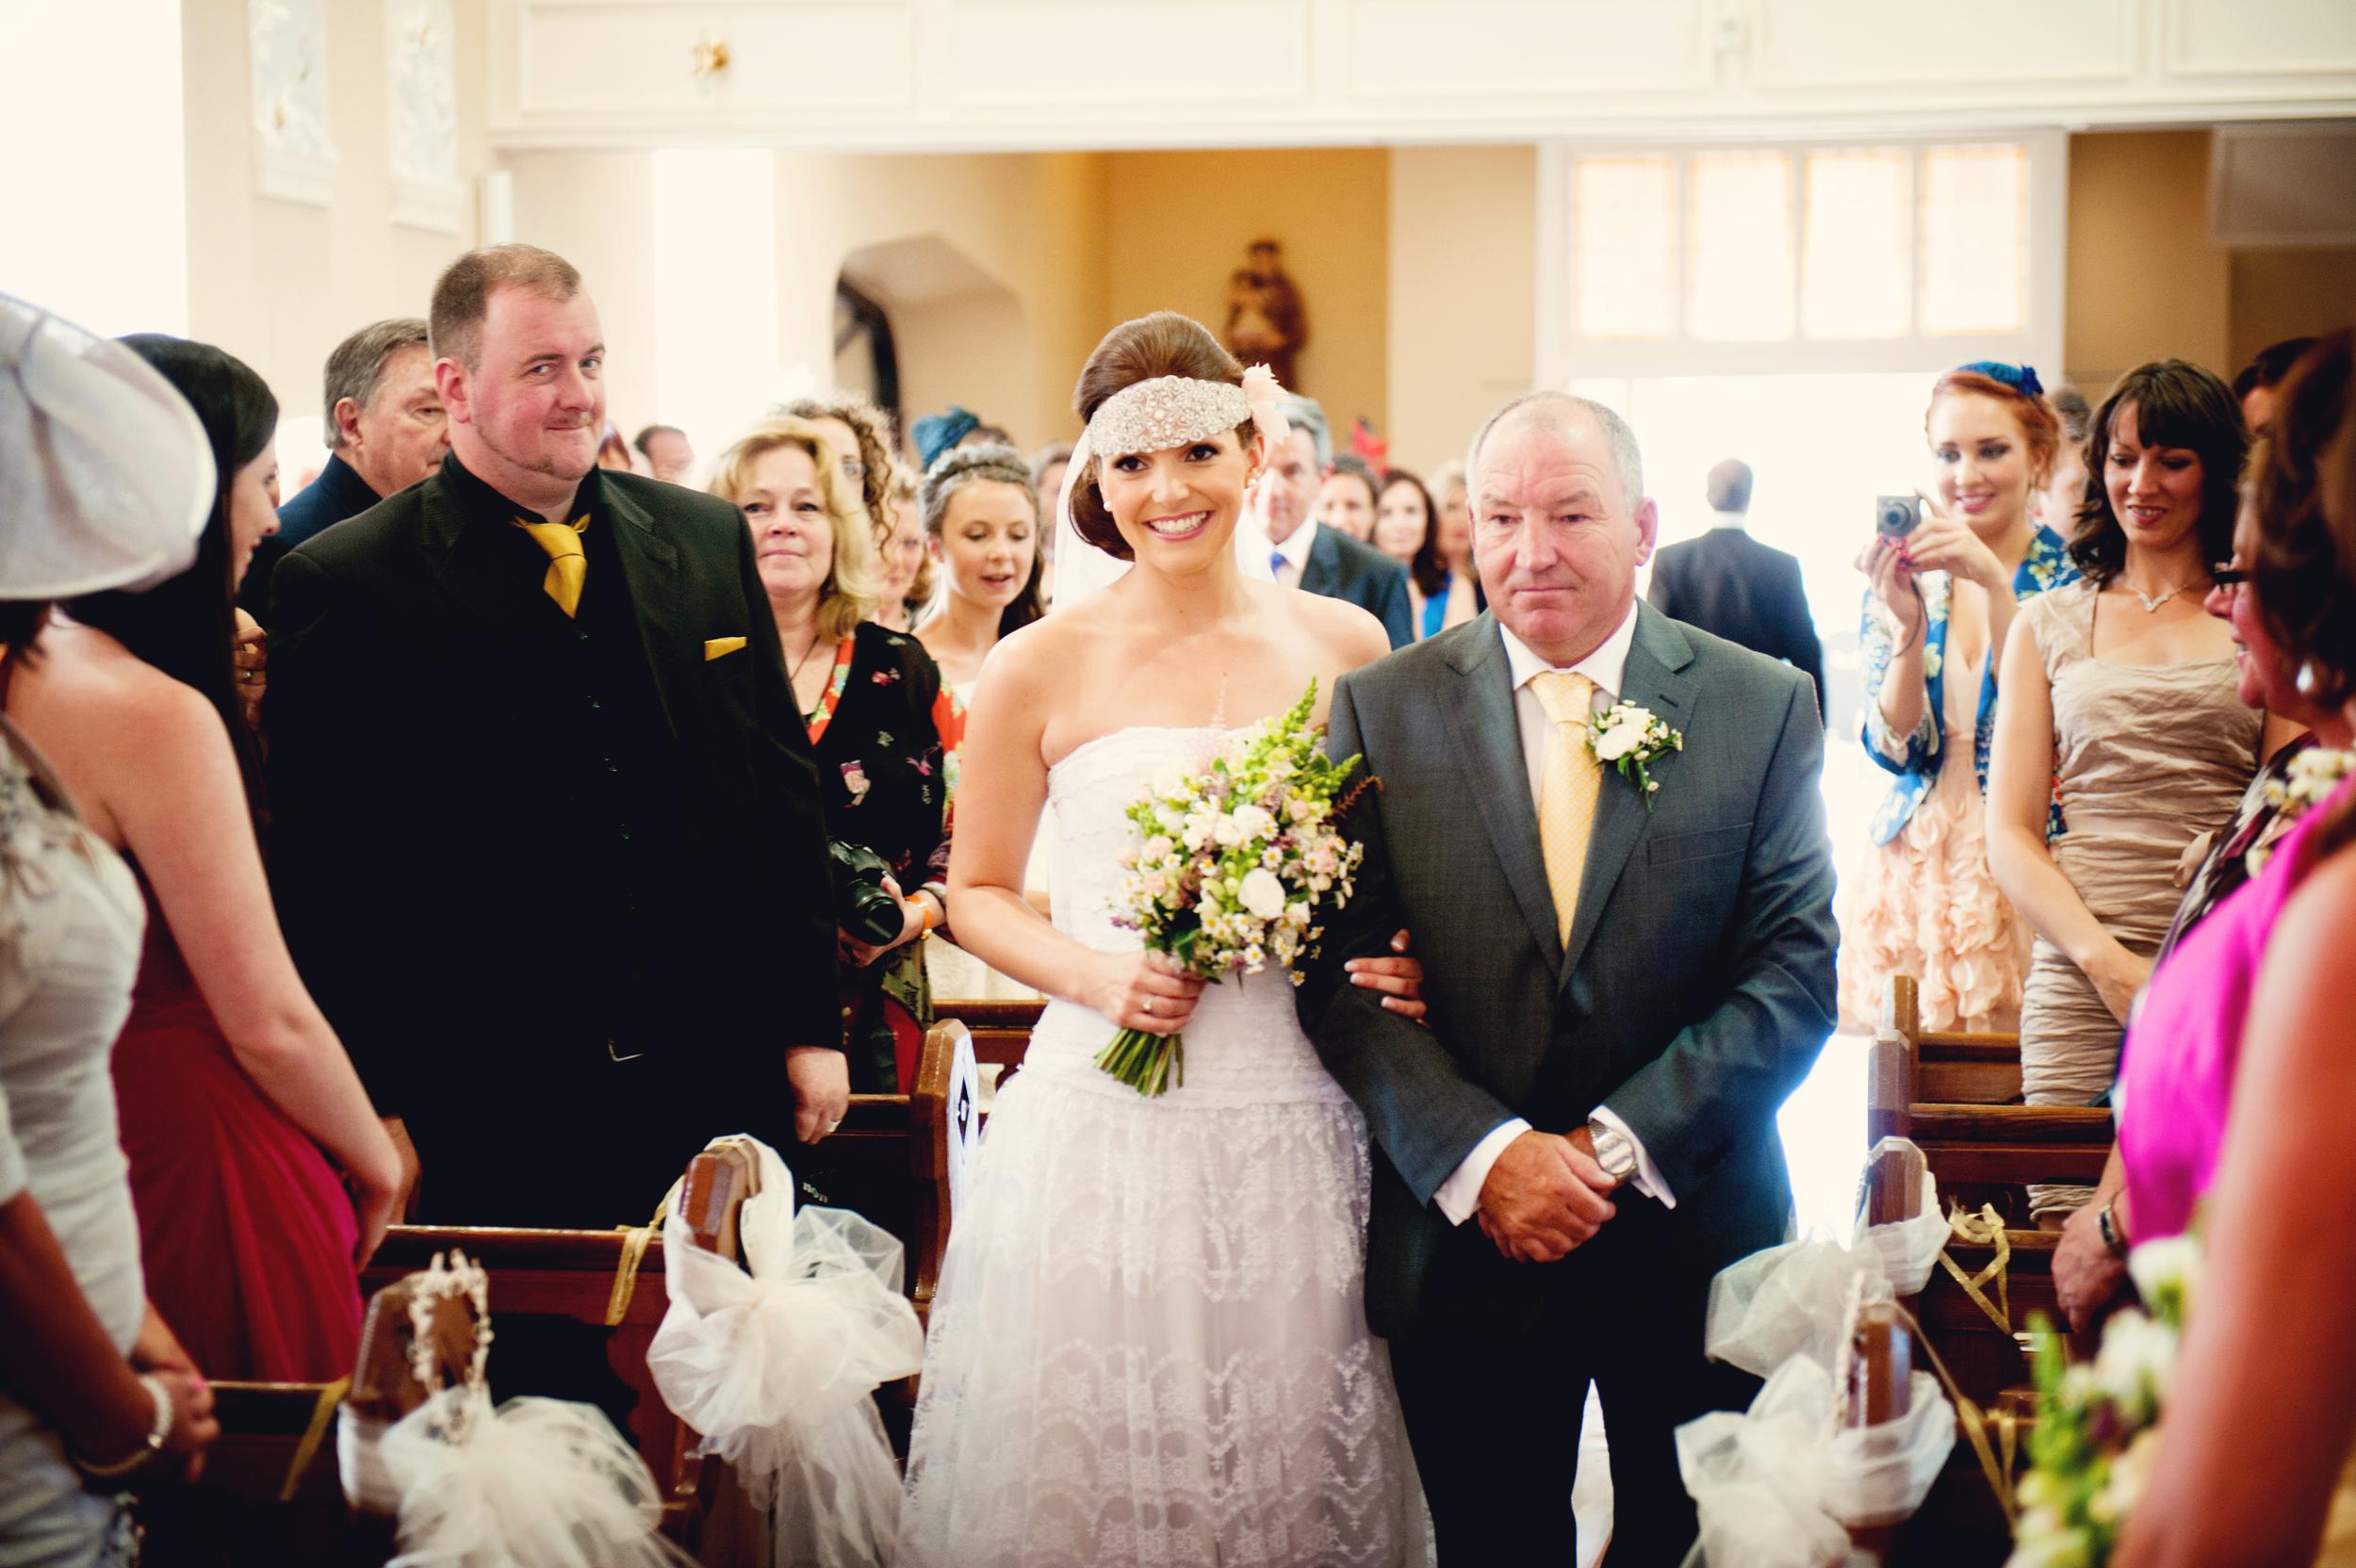 Ciara walking up the aisle with her Father. Photography:Weddings by KARA © - Wedding Location: Kilshane House, Tipperary, Ireland